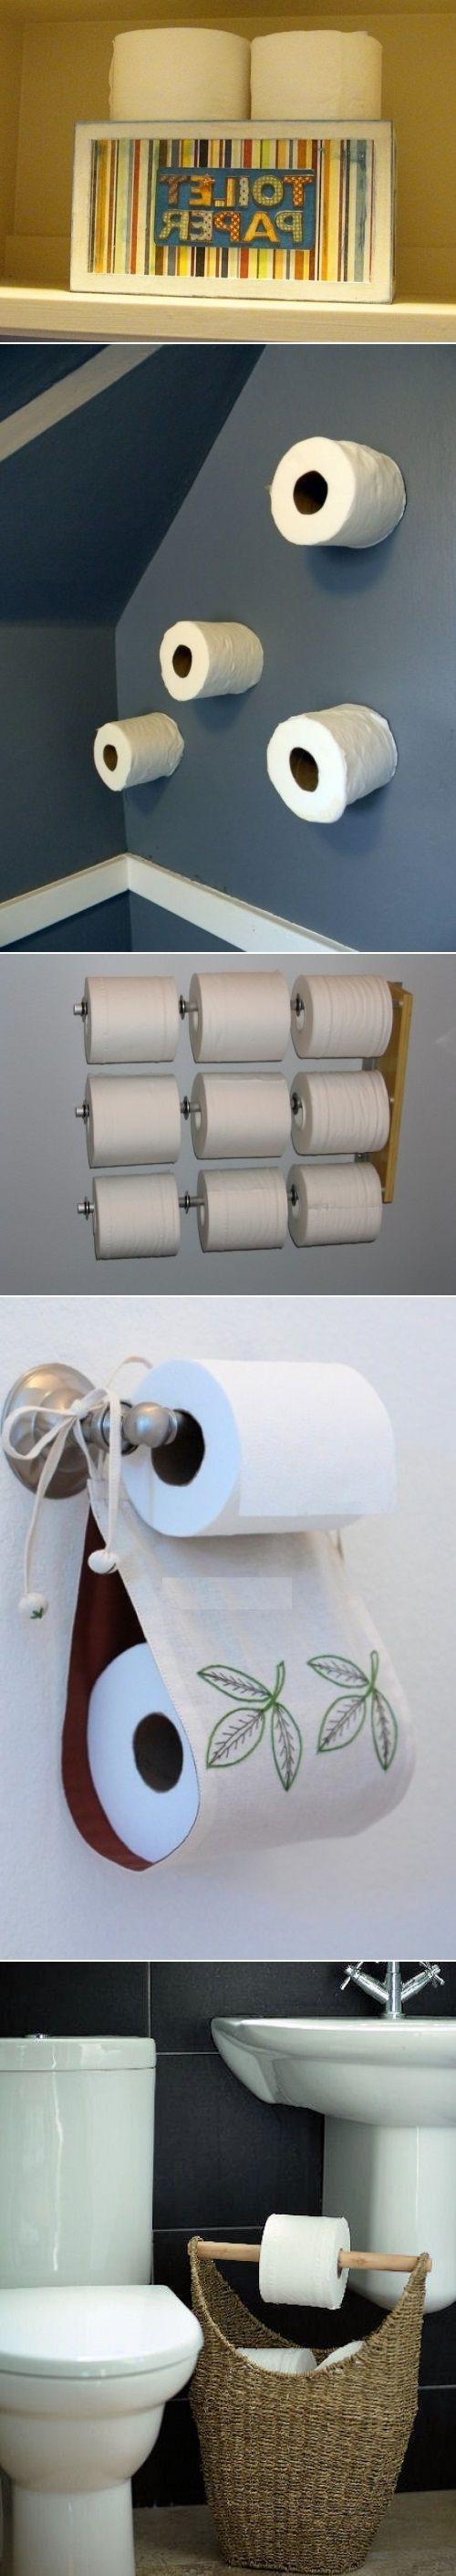 DIY Toilet Paper Storage Solutions